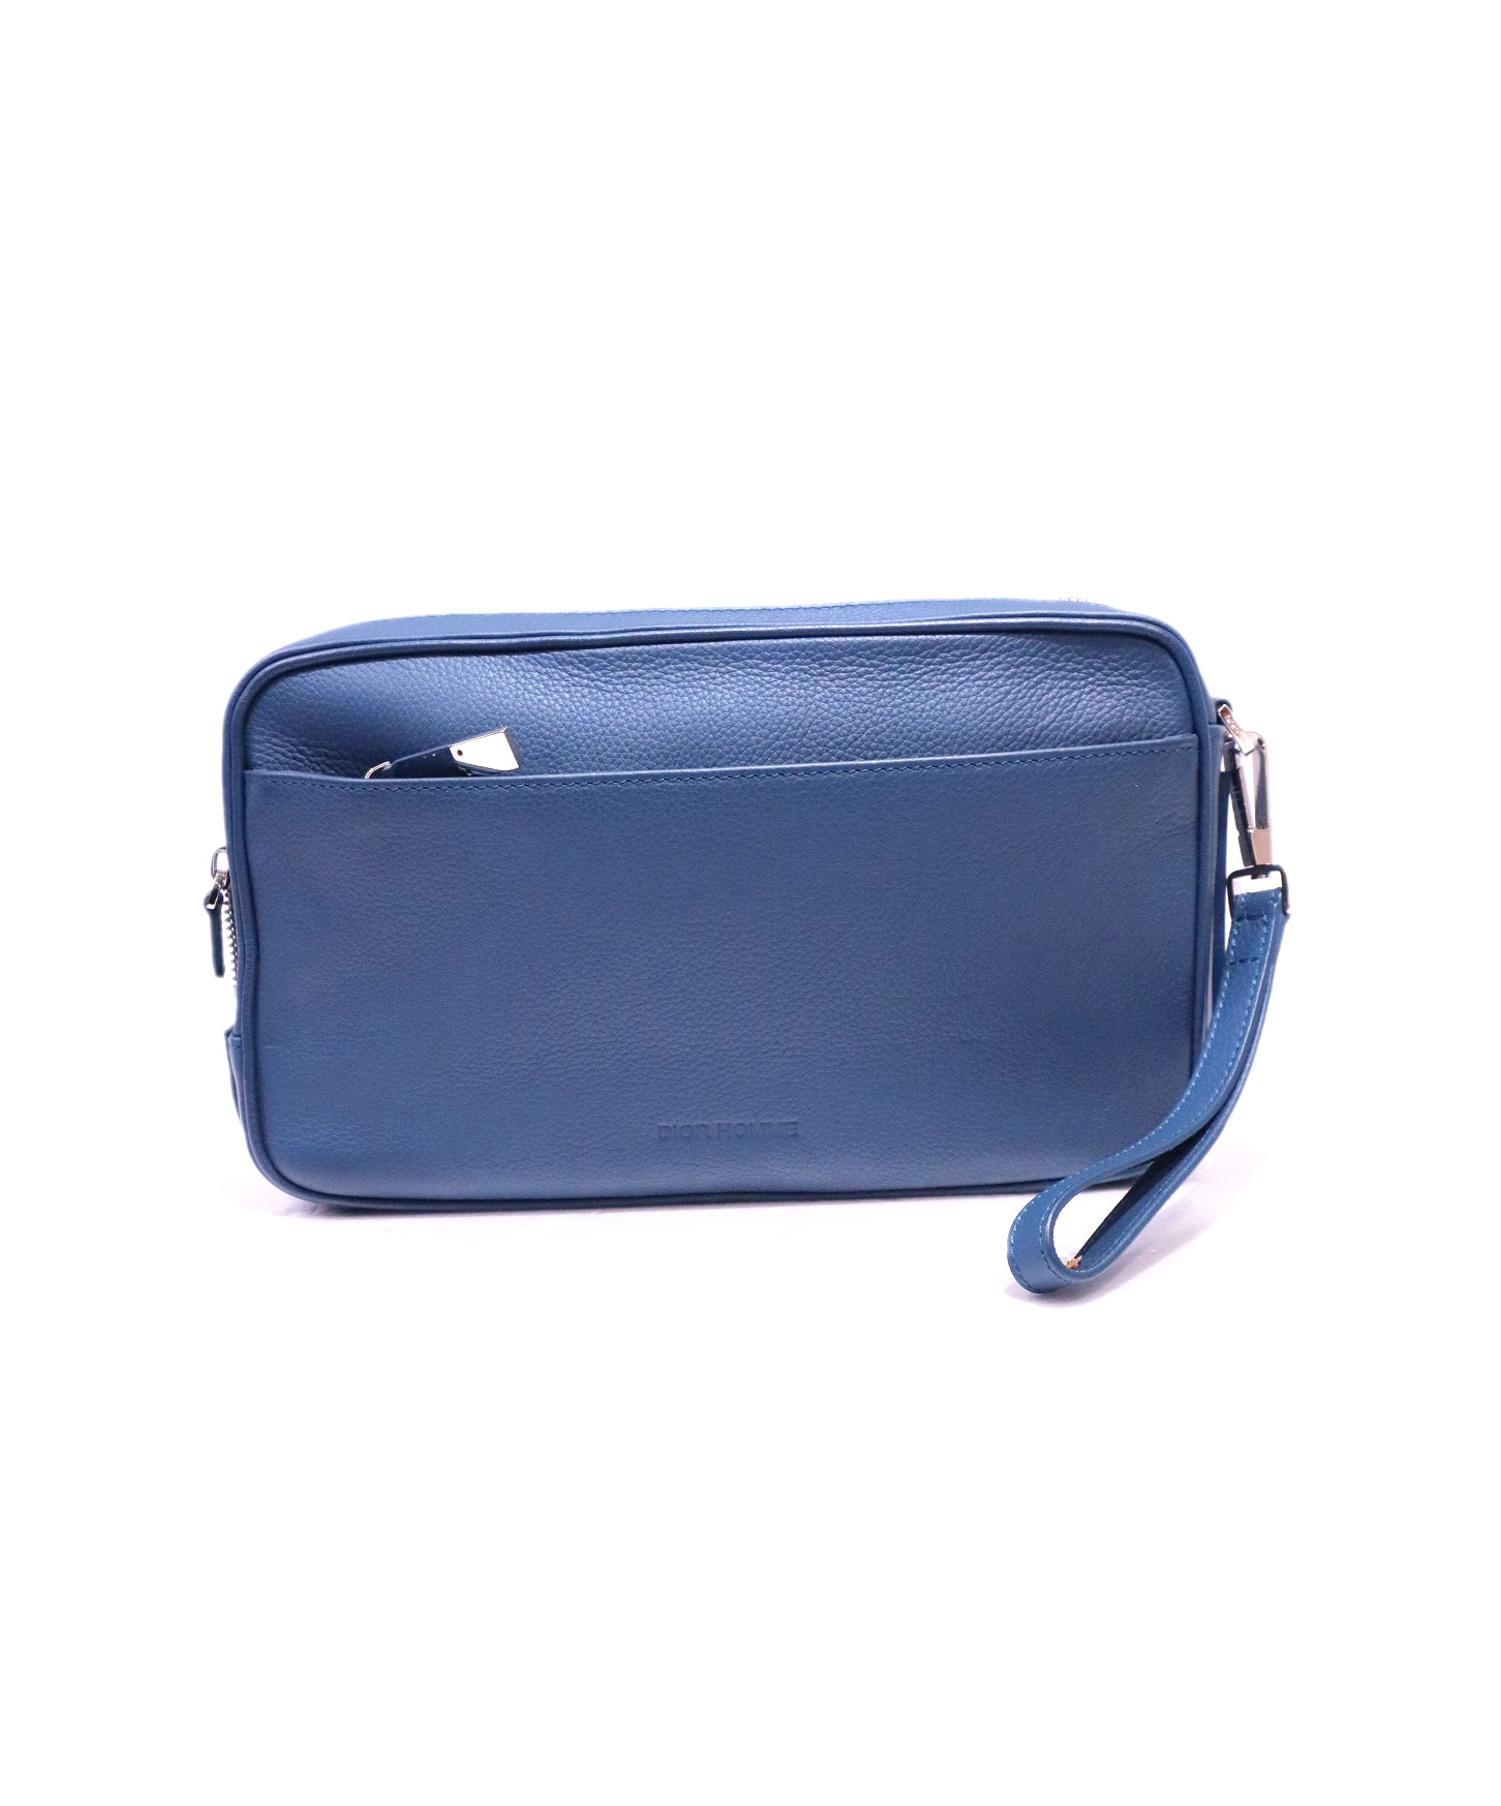 buy online 2b6cf 0357b [中古]Dior Homme(ディオールオム)のメンズ バッグ レザークラッチバッグ